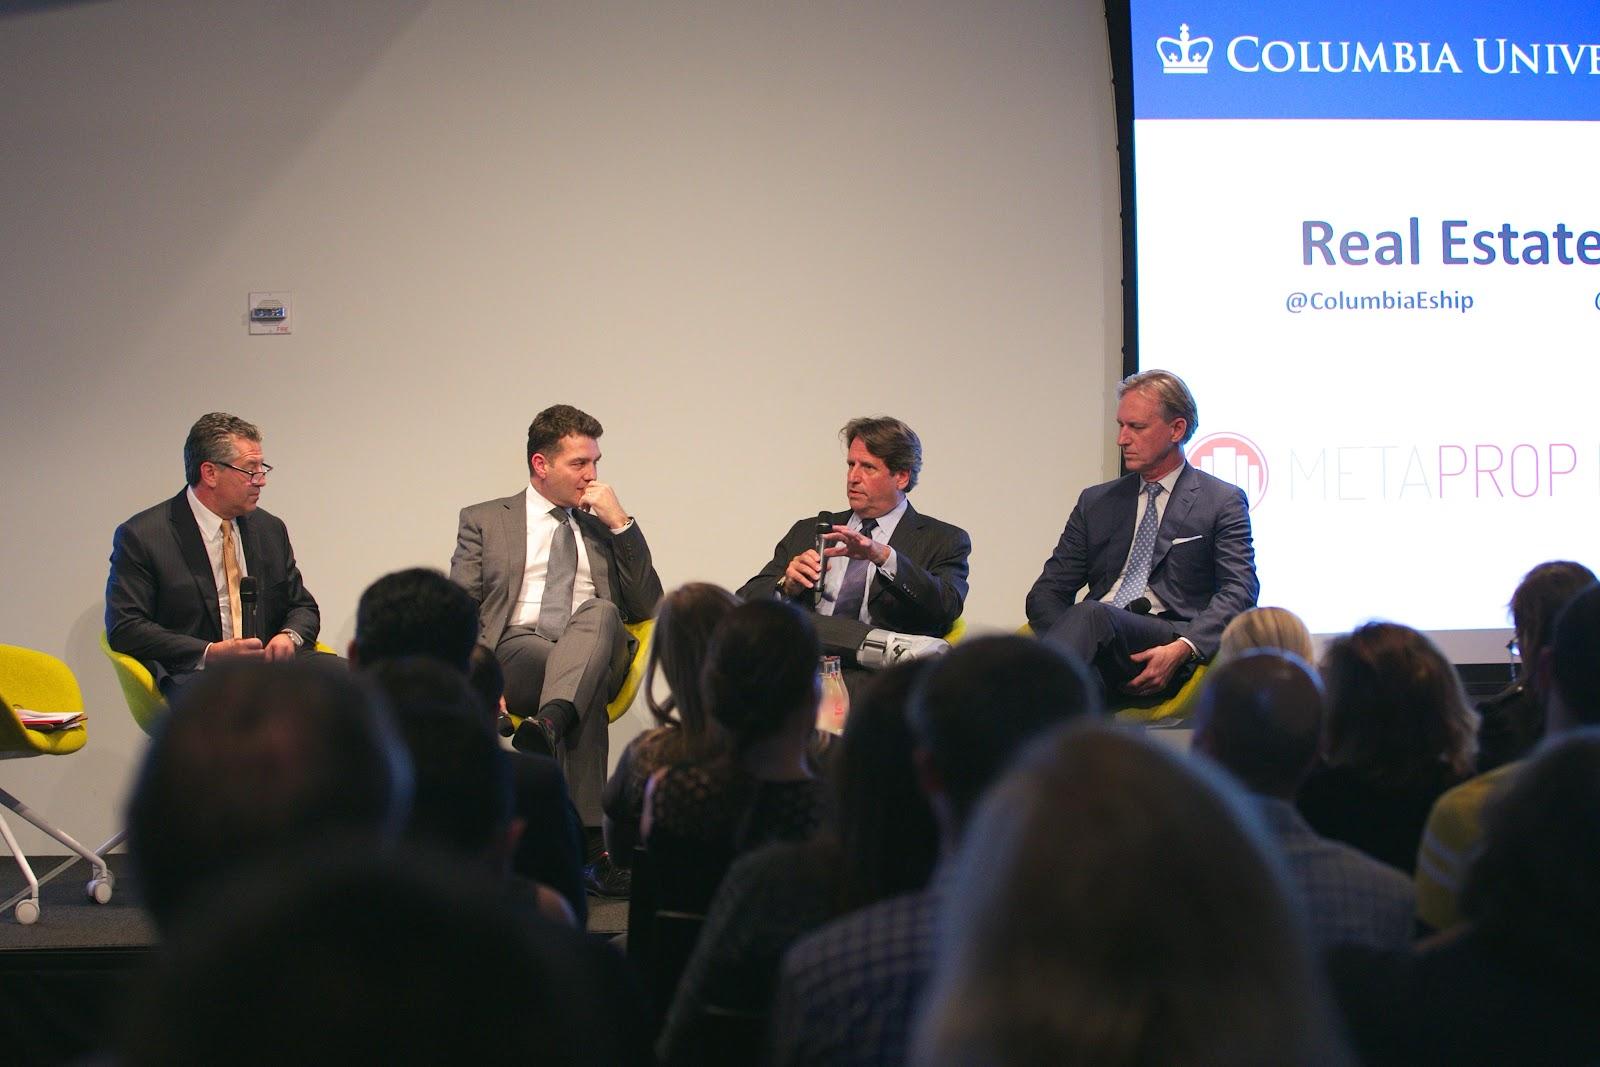 (From left) Marc Holliday, CEO, SL Green Realty Corp. | Denis Hickey, CEO LendLease the Americas| Robert Entin EVP & CIO, Vornado Realty Trust | Jamie von Klemperer, President KPF